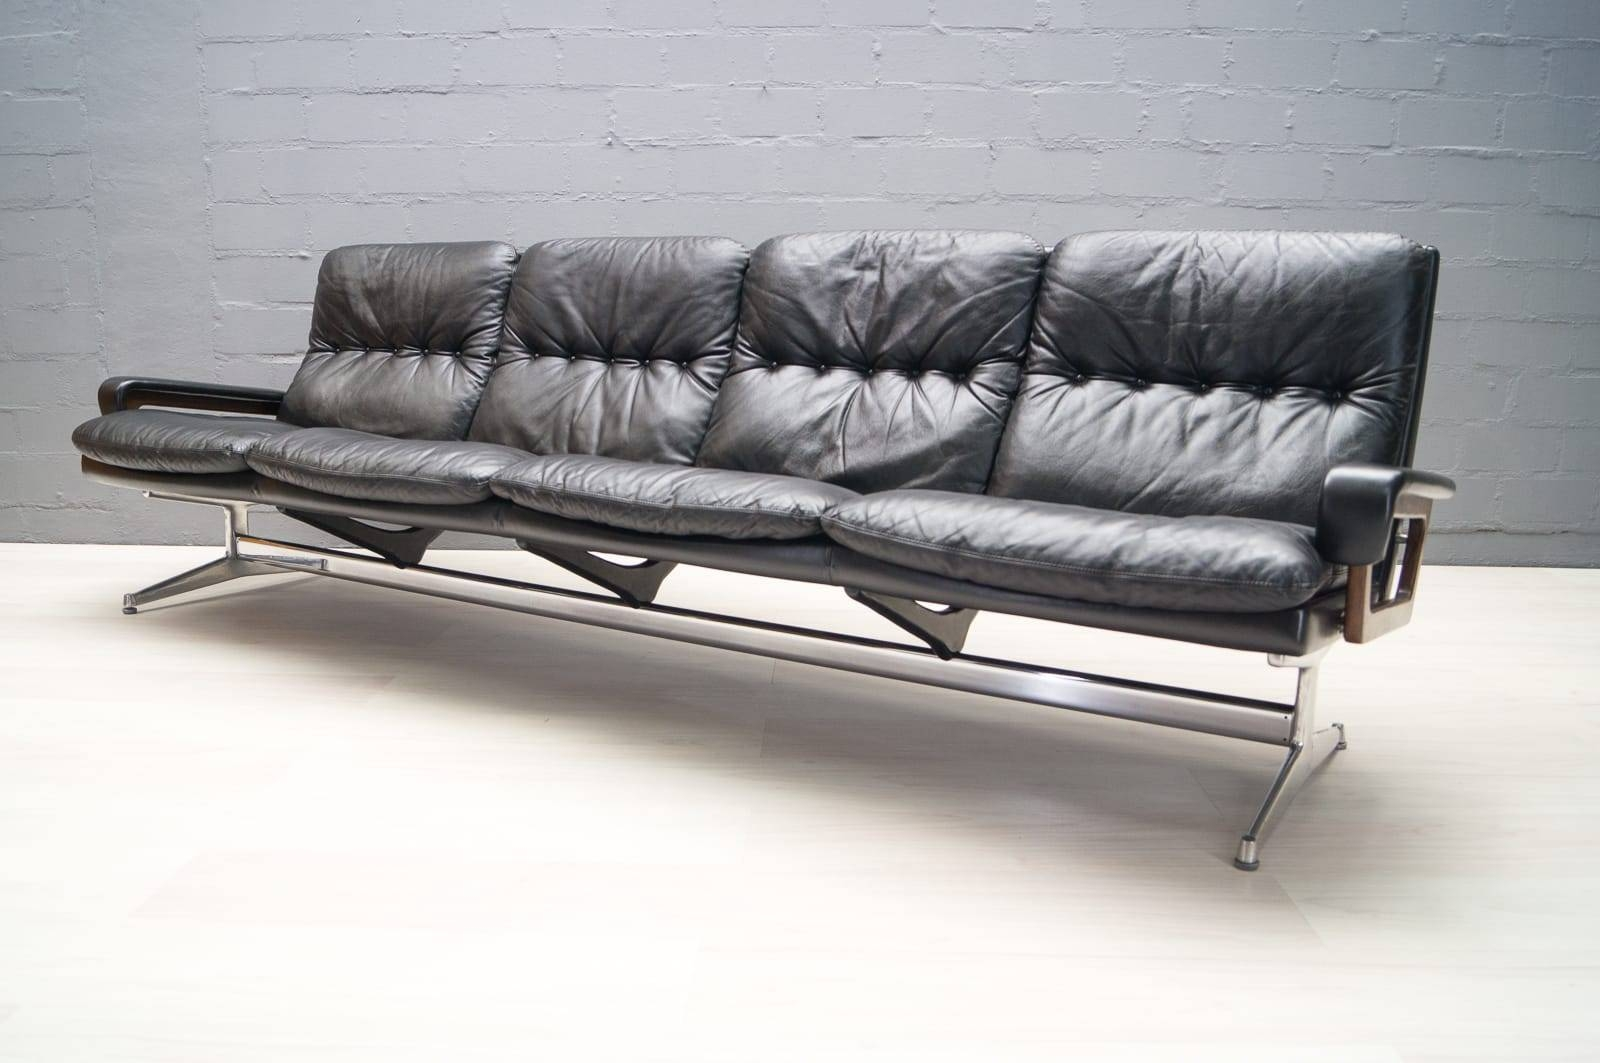 Vintage Four-Seater Sofaandré Vandenbeuck For Strässle For in Four Seater Sofas (Image 26 of 30)